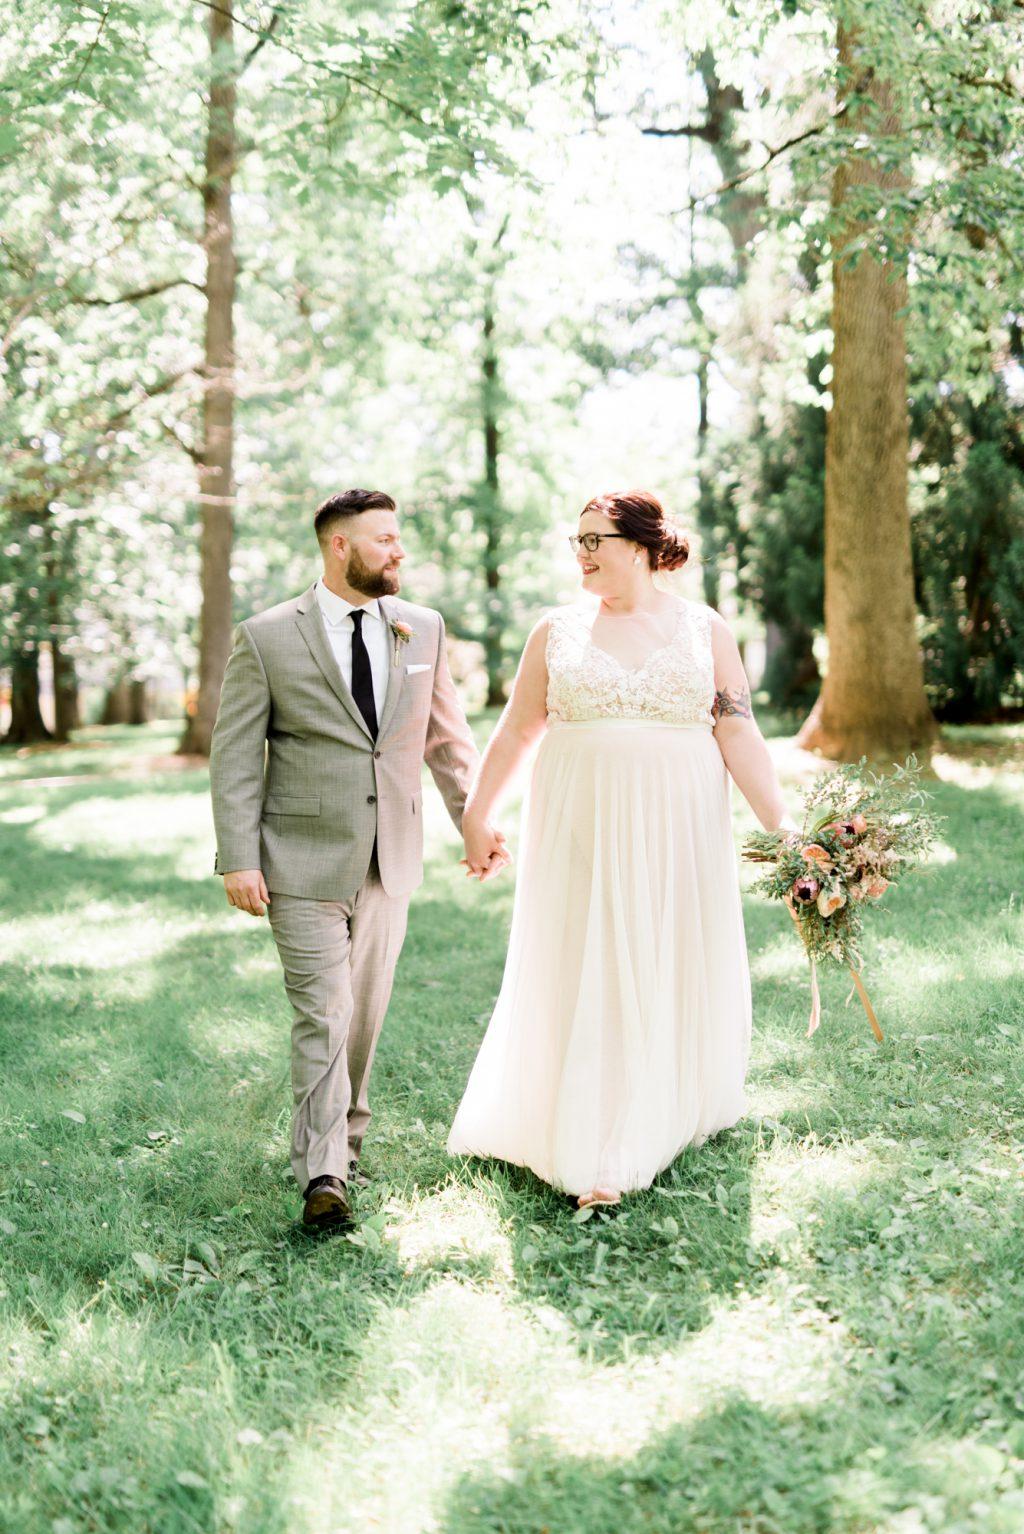 haley-richter-photo-west-chester-summer-wedding-boxcar-brewery-095